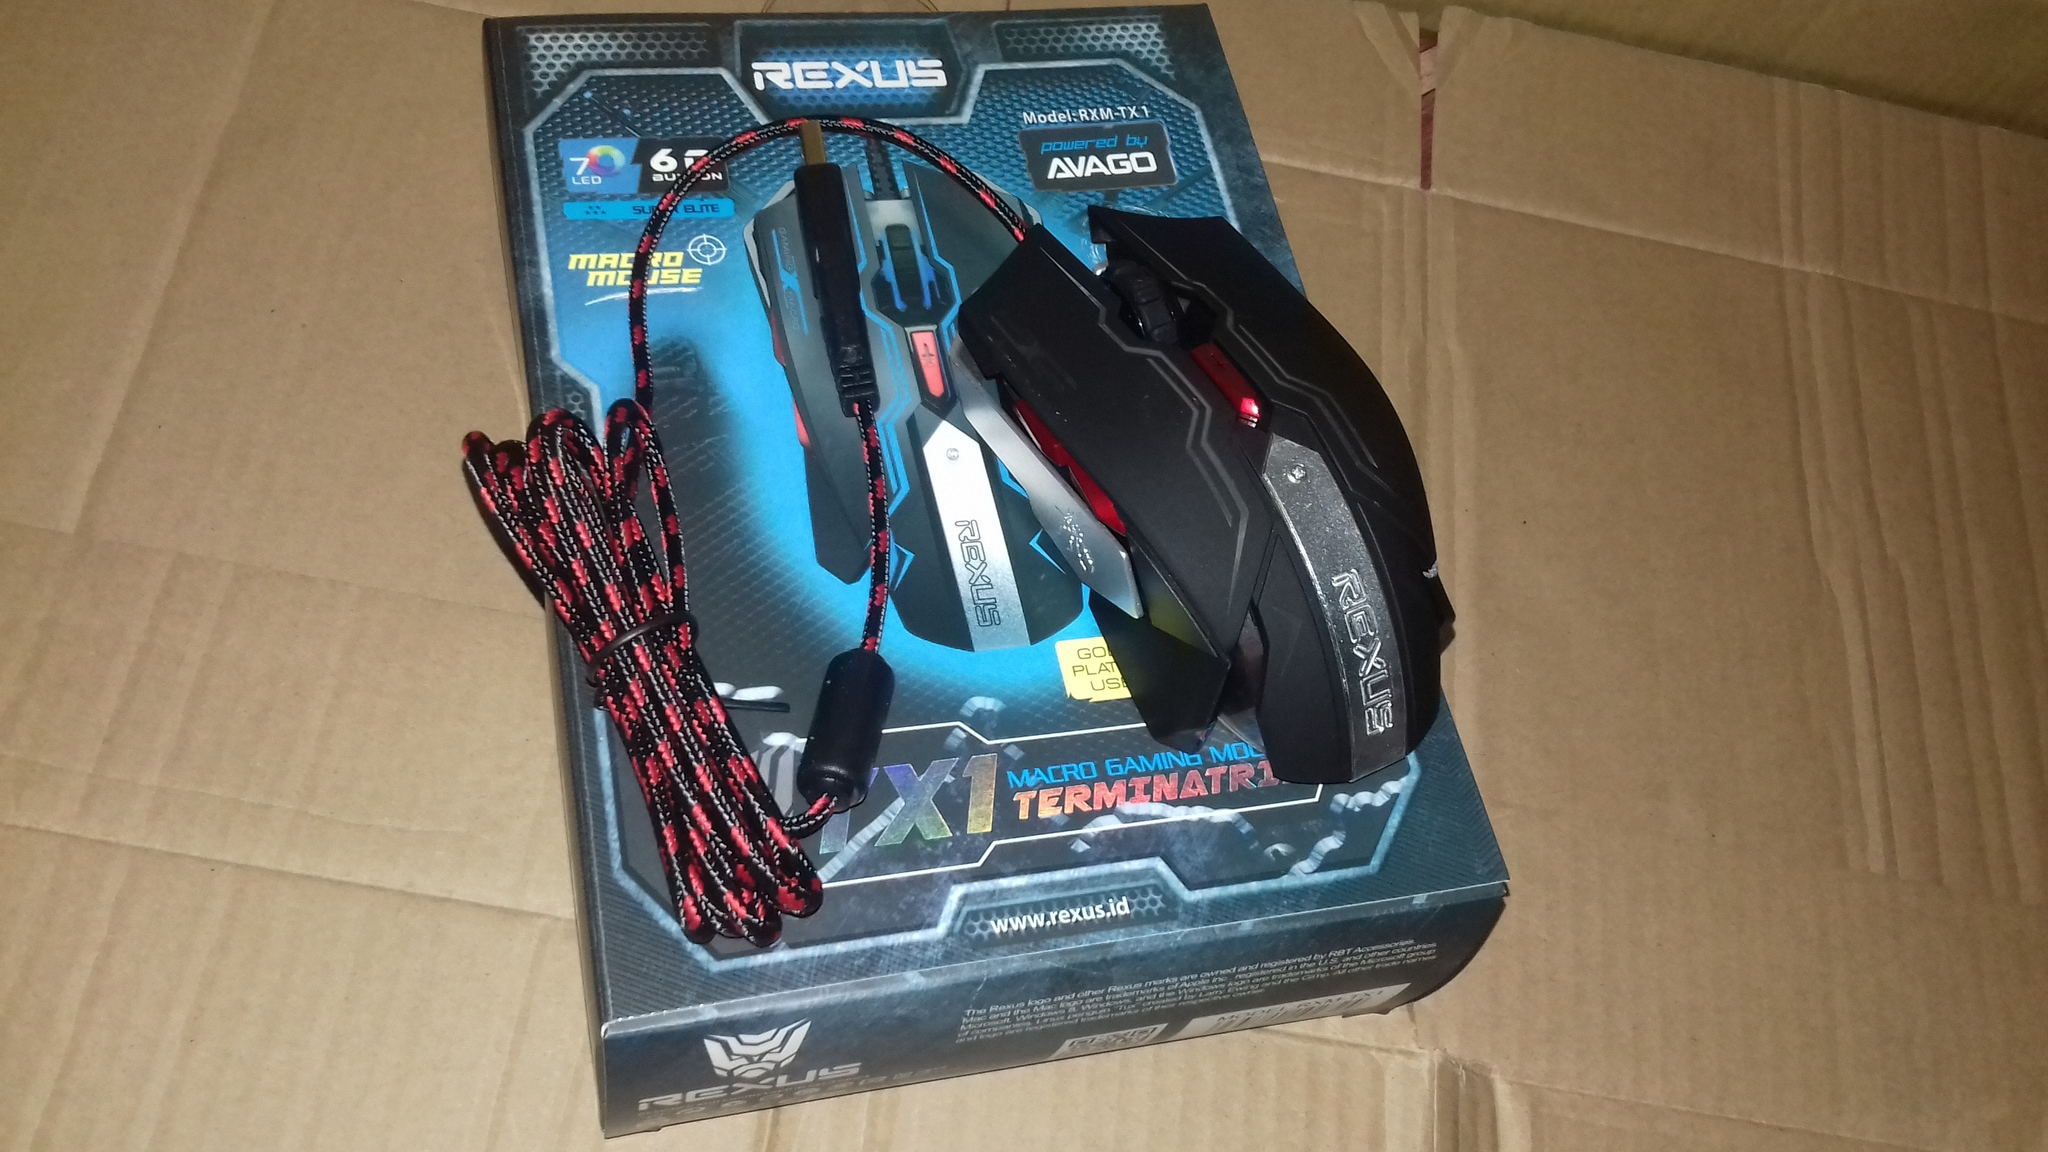 Rexus Mouse Gaming Tx3 Daftar Harga Terlengkap Indonesia G4 Jual Macro Tx 1 Terminatrix 7 Led 6d Buton 4000dpi Aska Computech